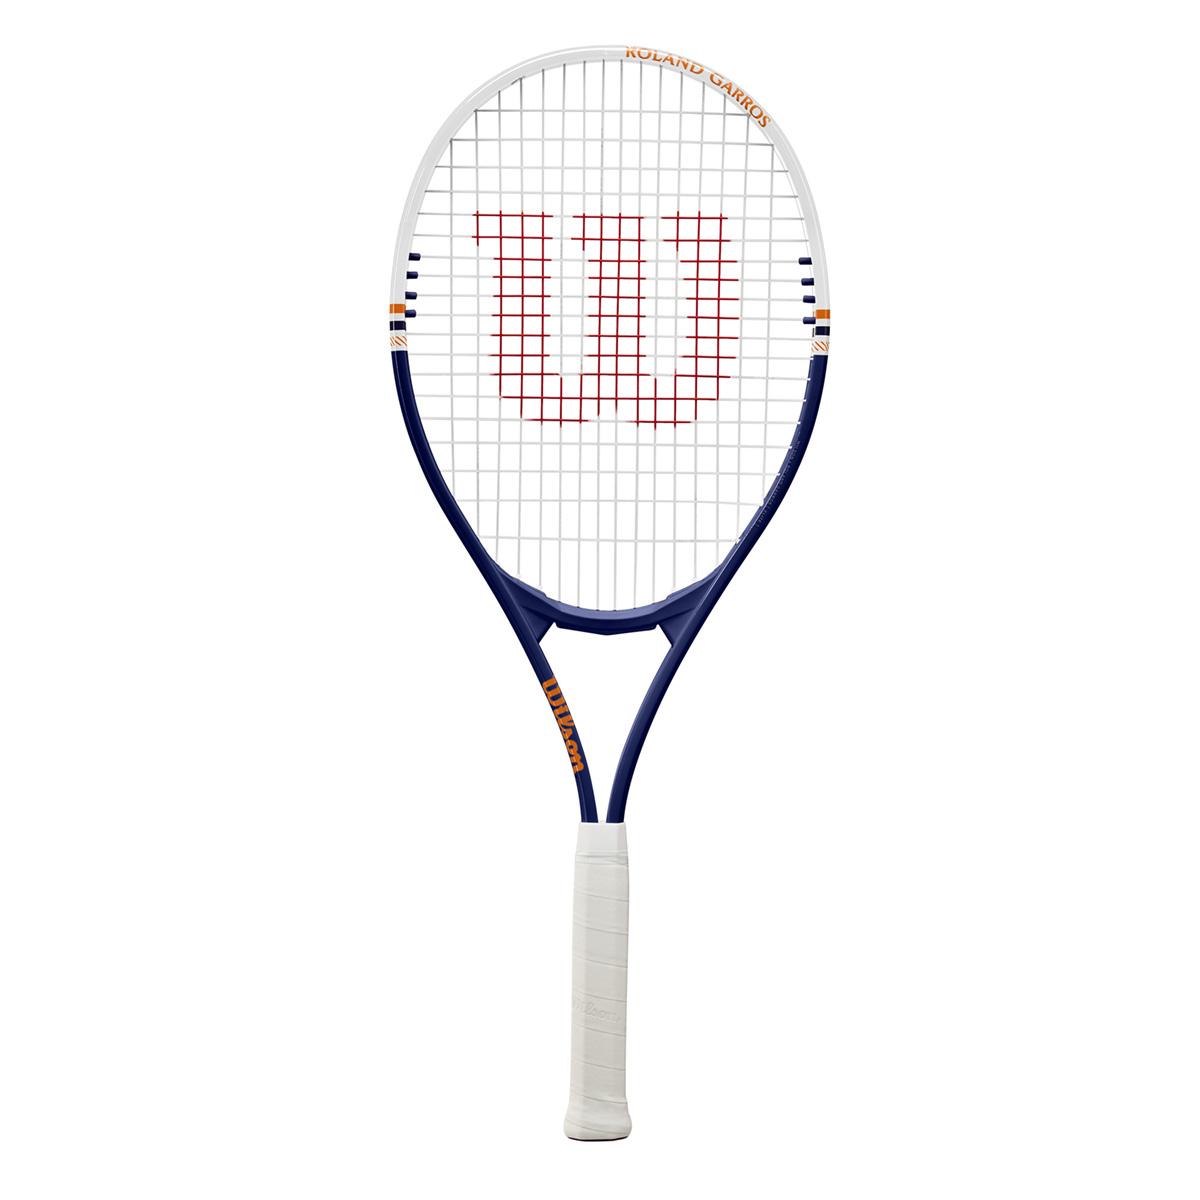 WR070410U_0_Roland_Garros_Elite_Adult_WH_NA.png.cq5dam.web.2000.2000